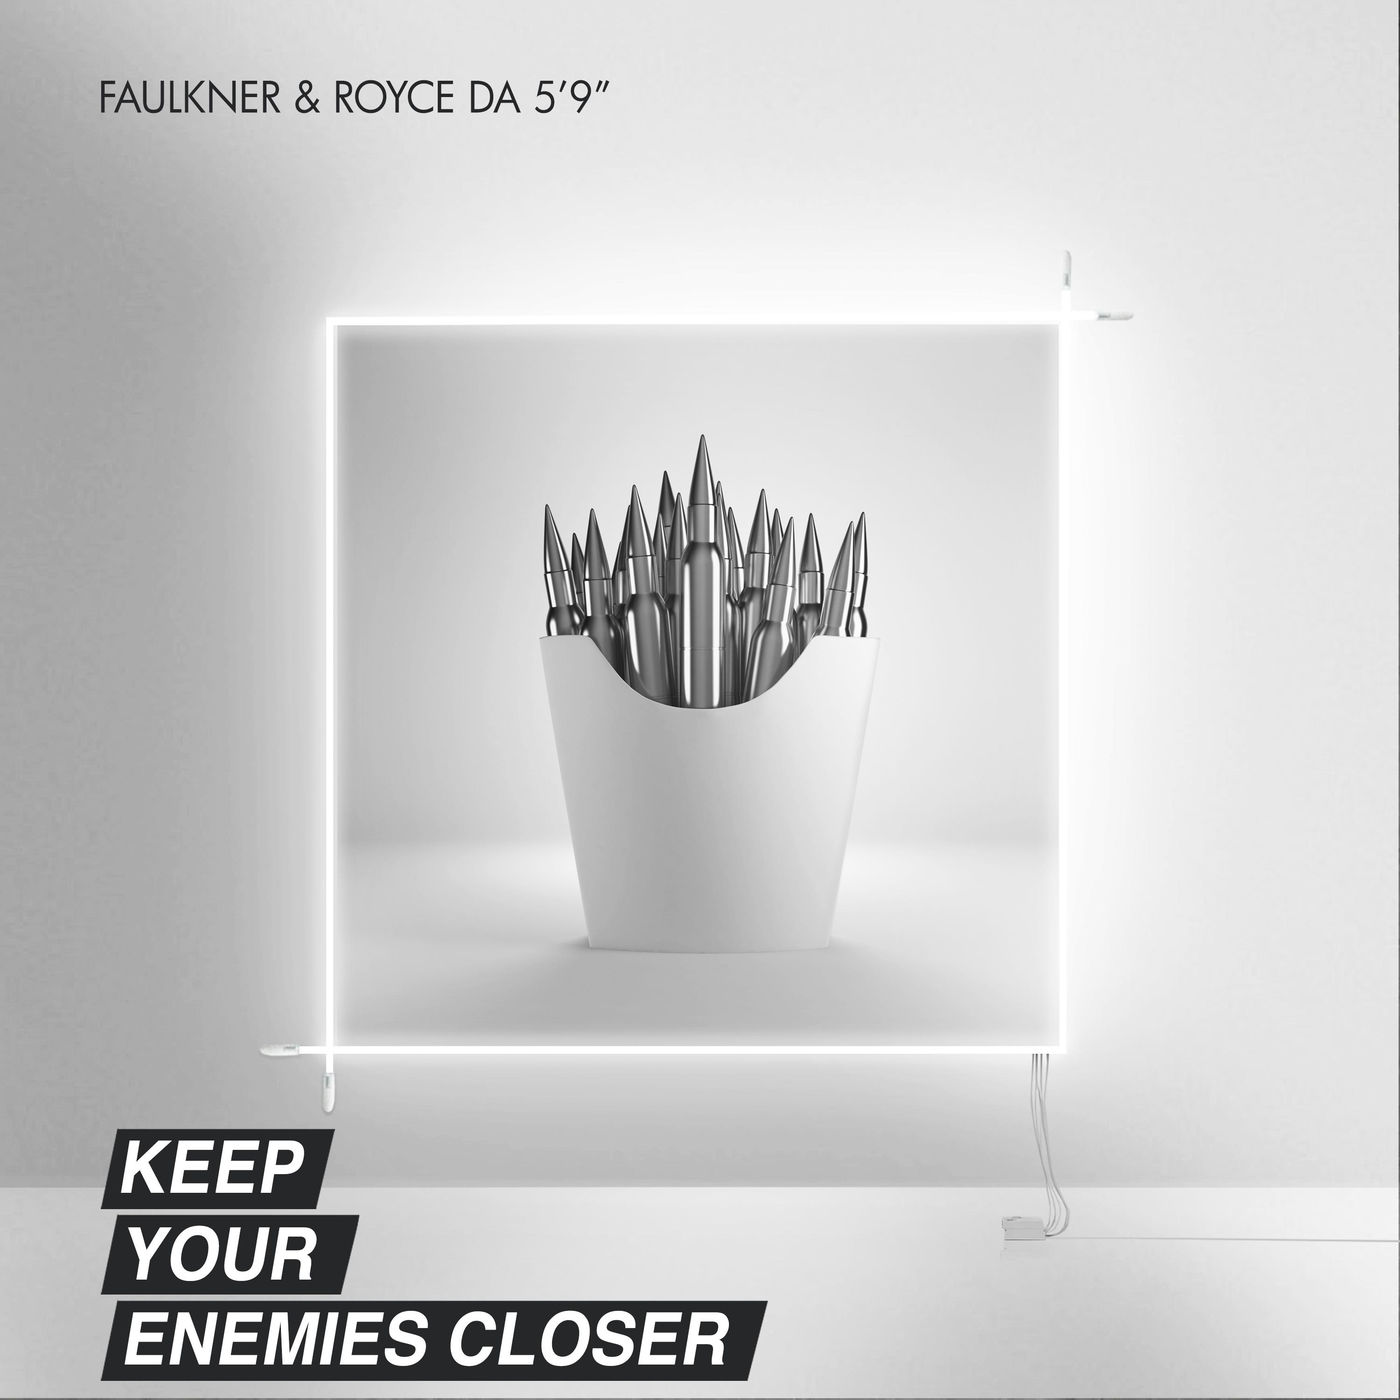 "Faulkner & Royce da 5'9"" - Keep Your Enemies Closer - Single Cover"